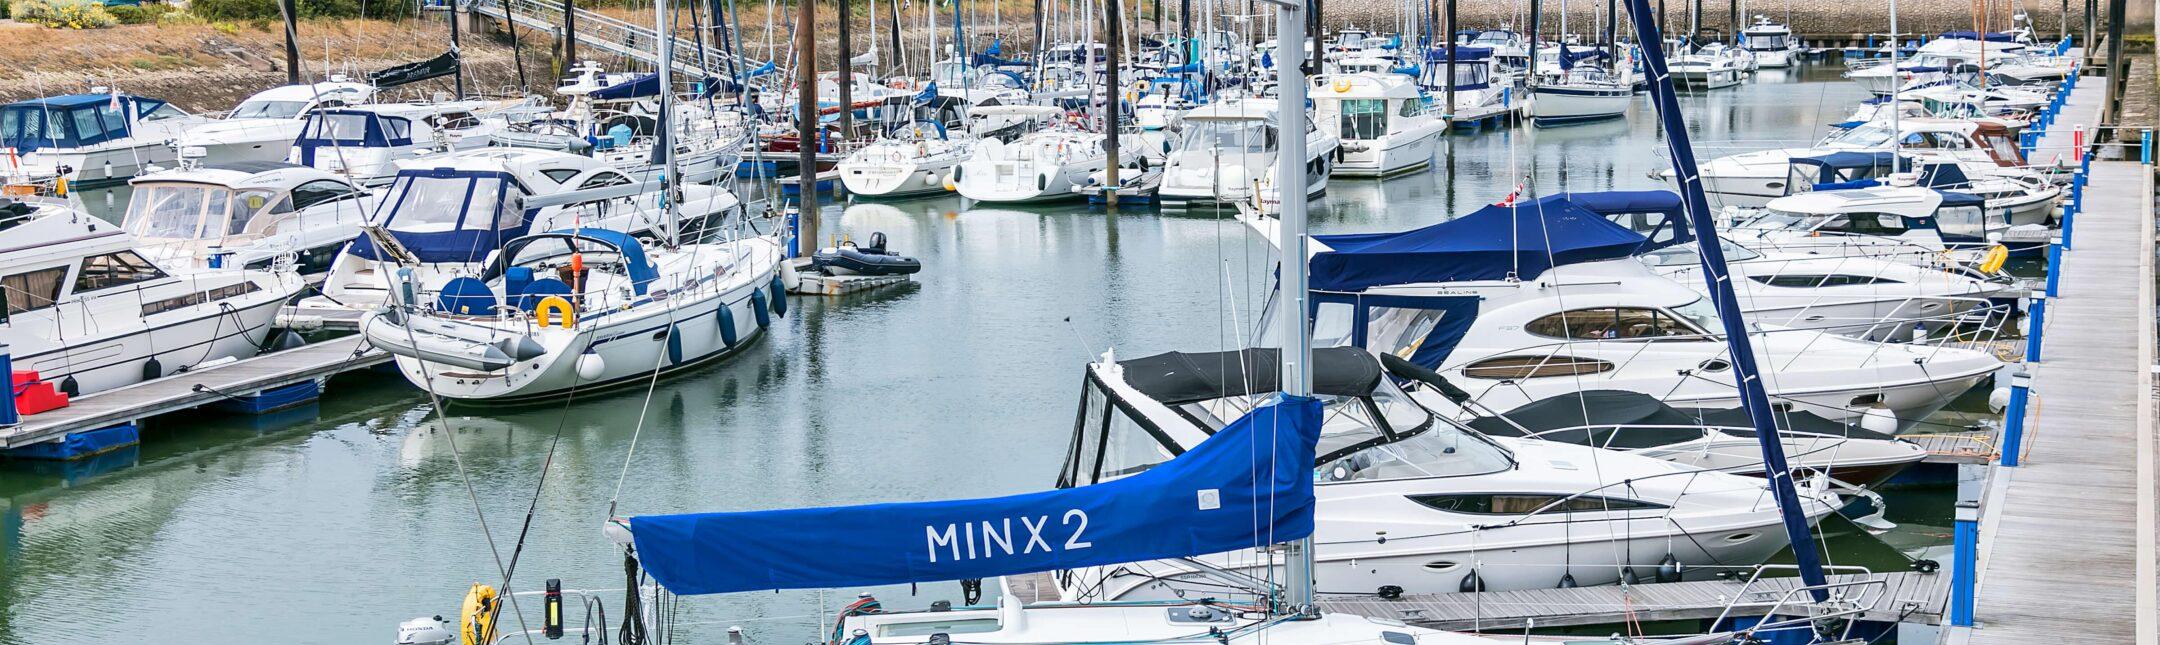 Deganwy Marina 36